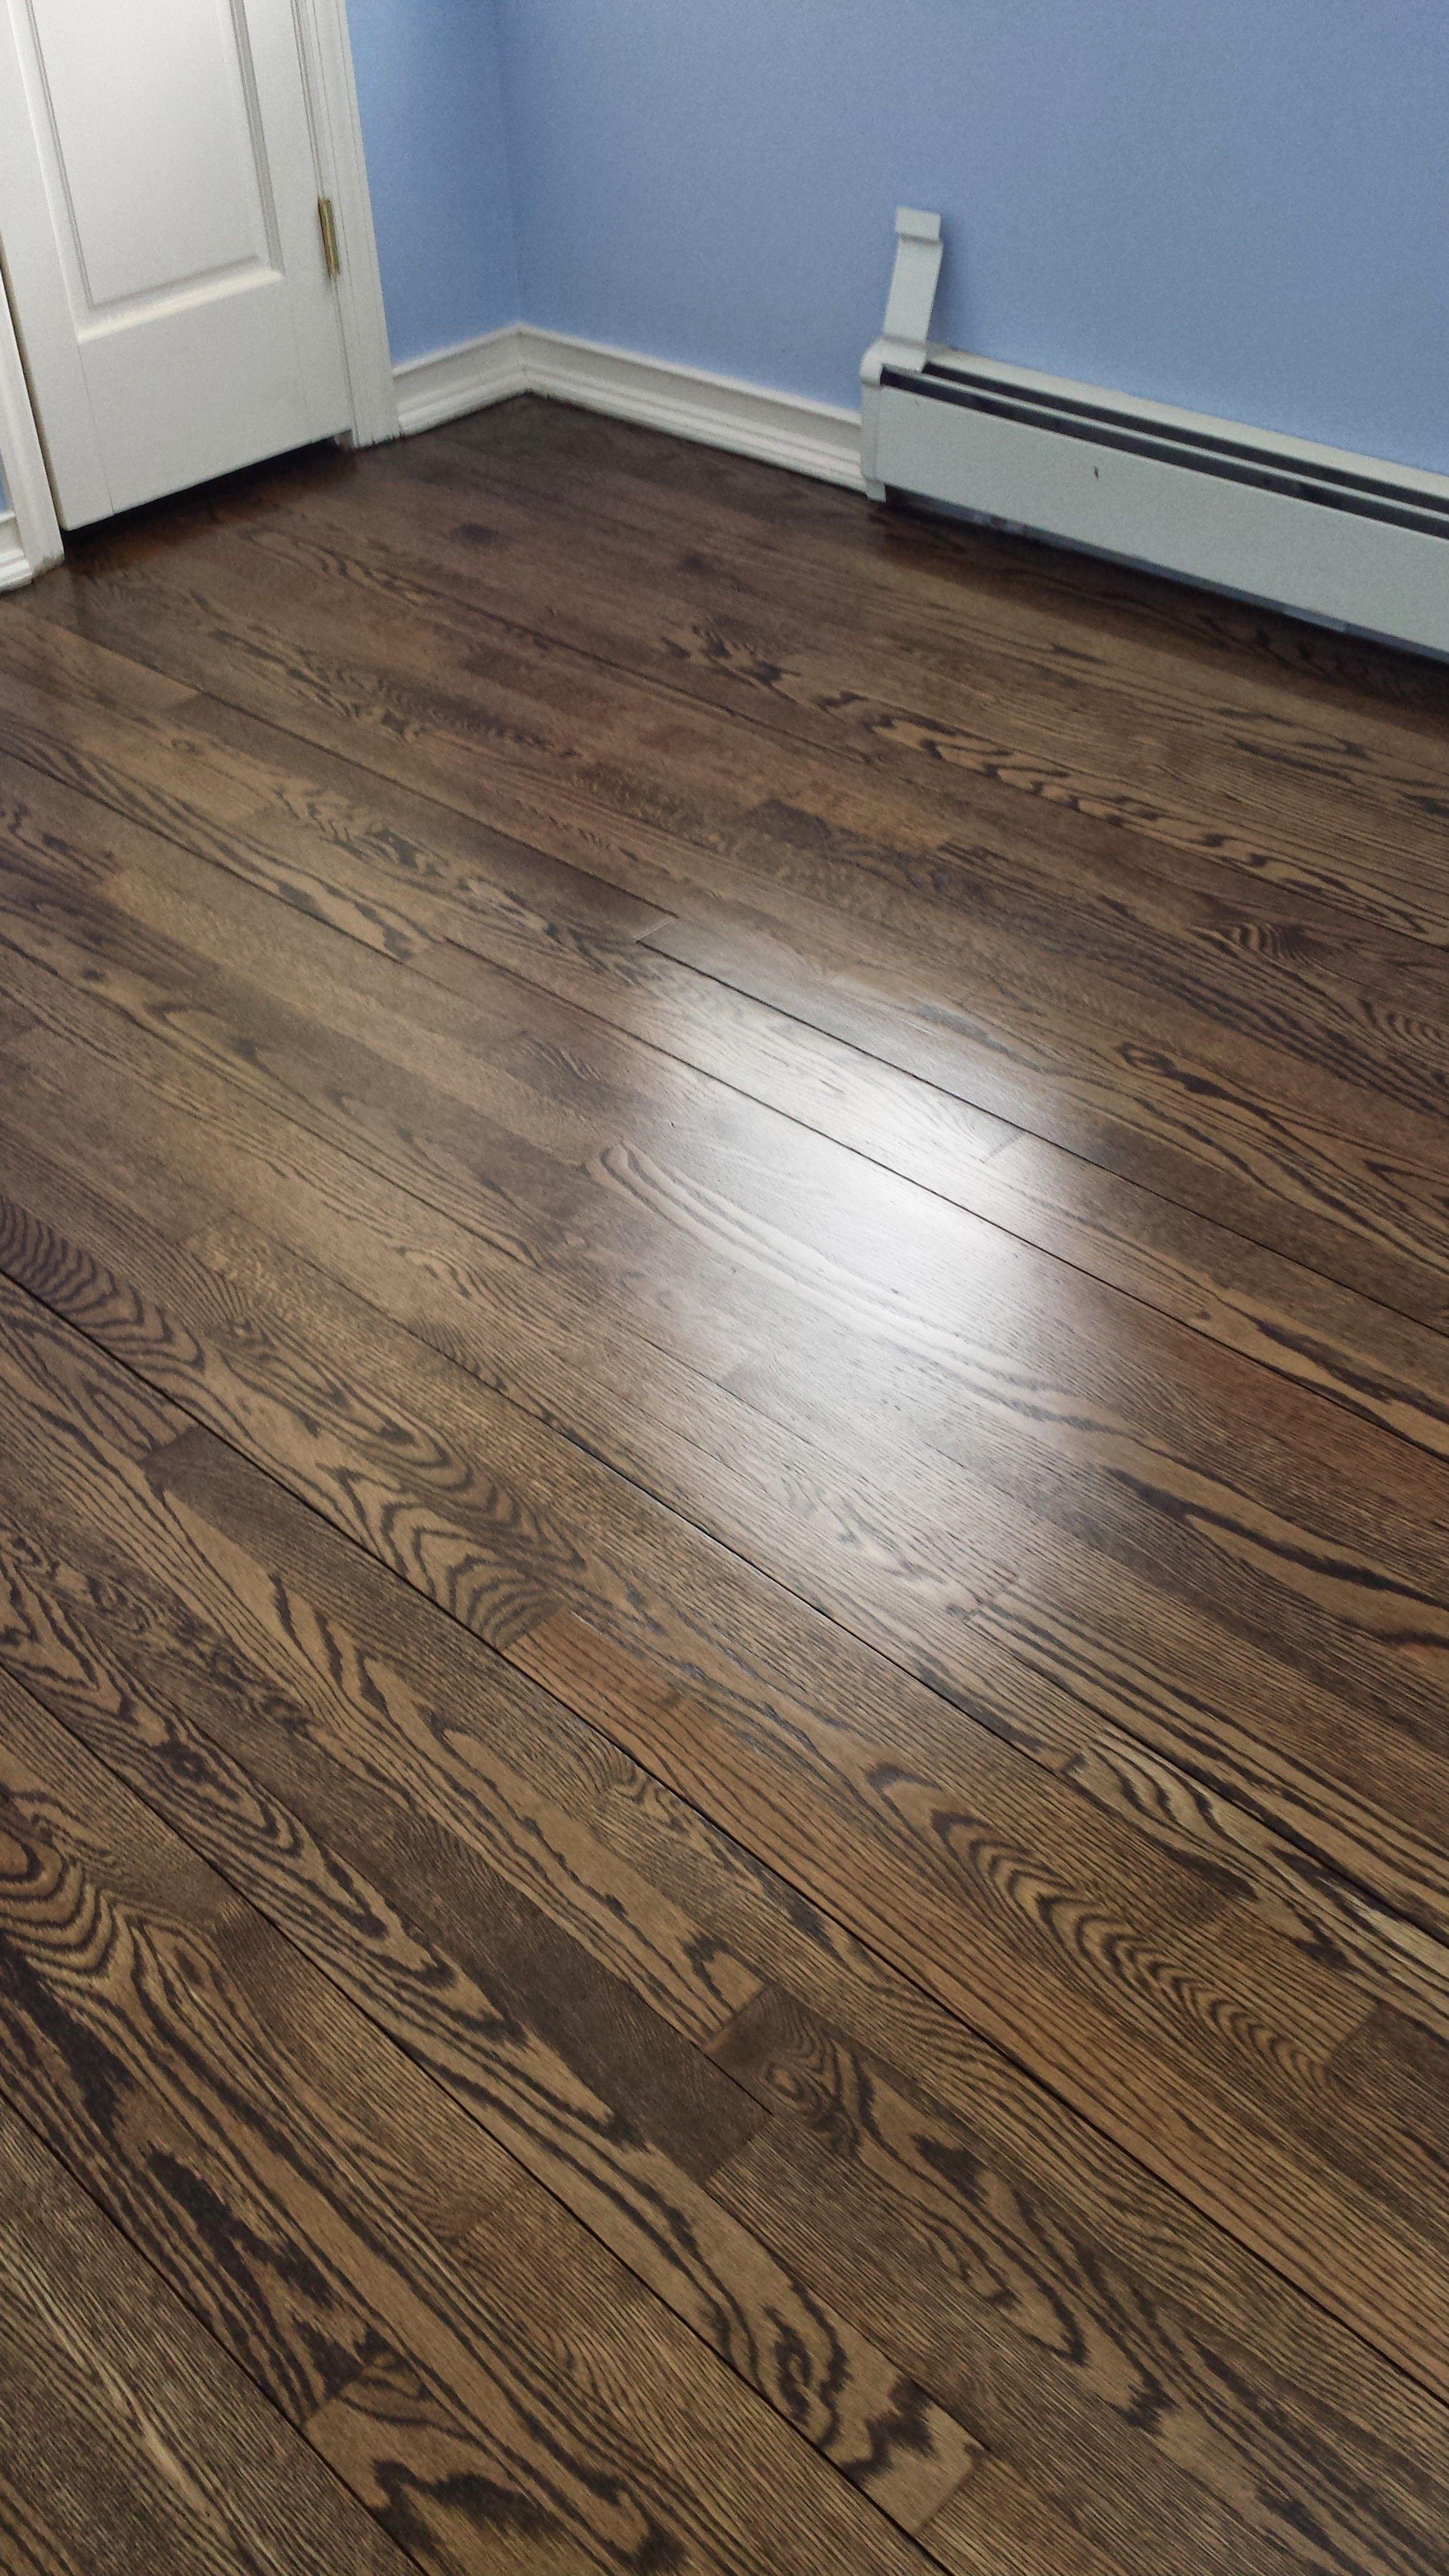 how much does sanding hardwood floors cost of sanding hardwood floors diy floor inside sanding hardwood floors diy great methods to use for refinishing hardwood floors